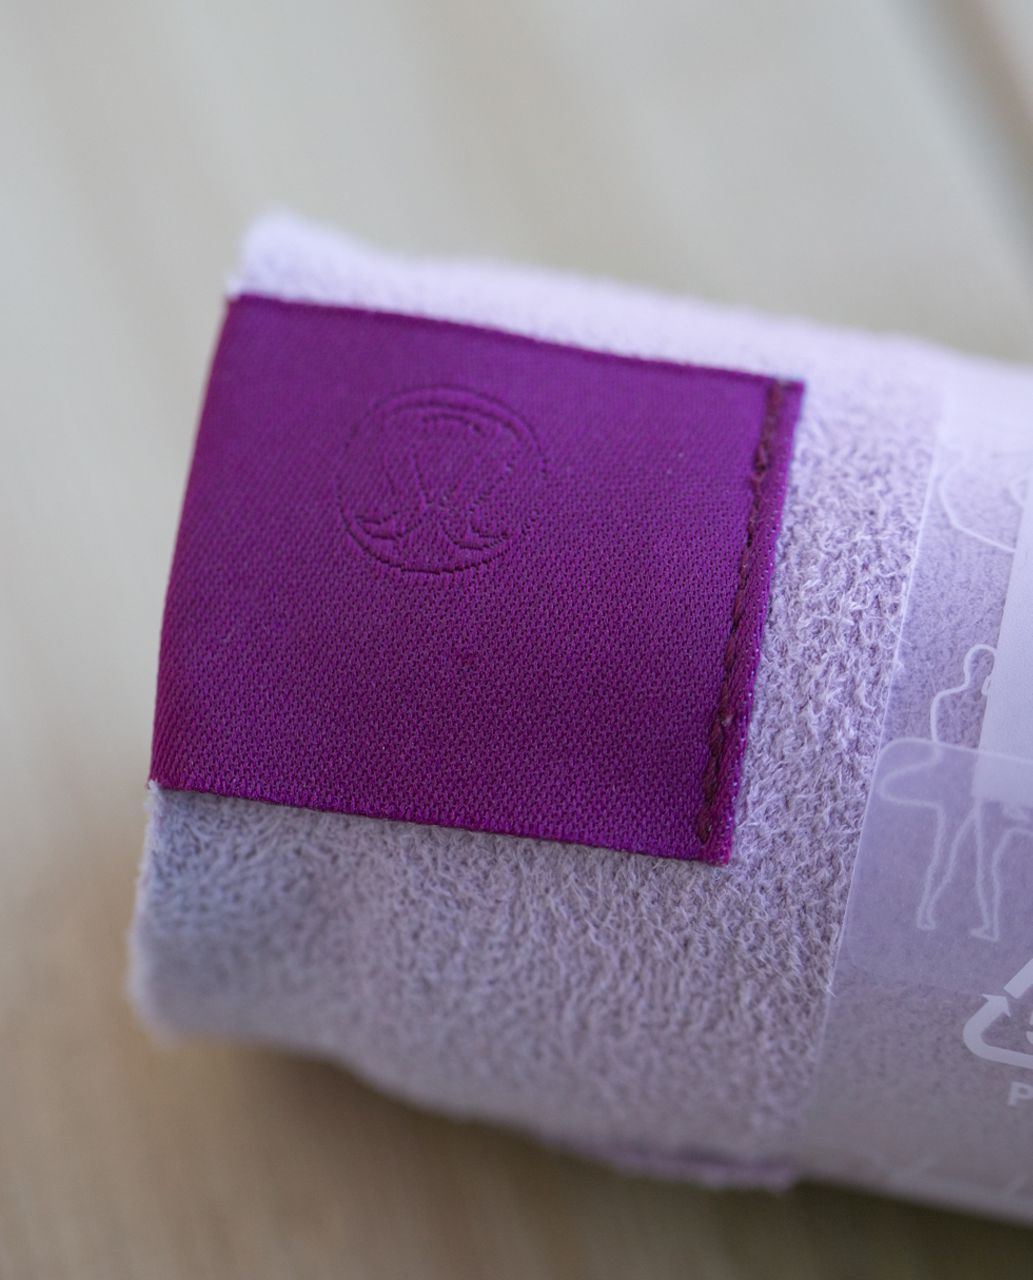 Lululemon The (Small) Towel - Storm Mauve